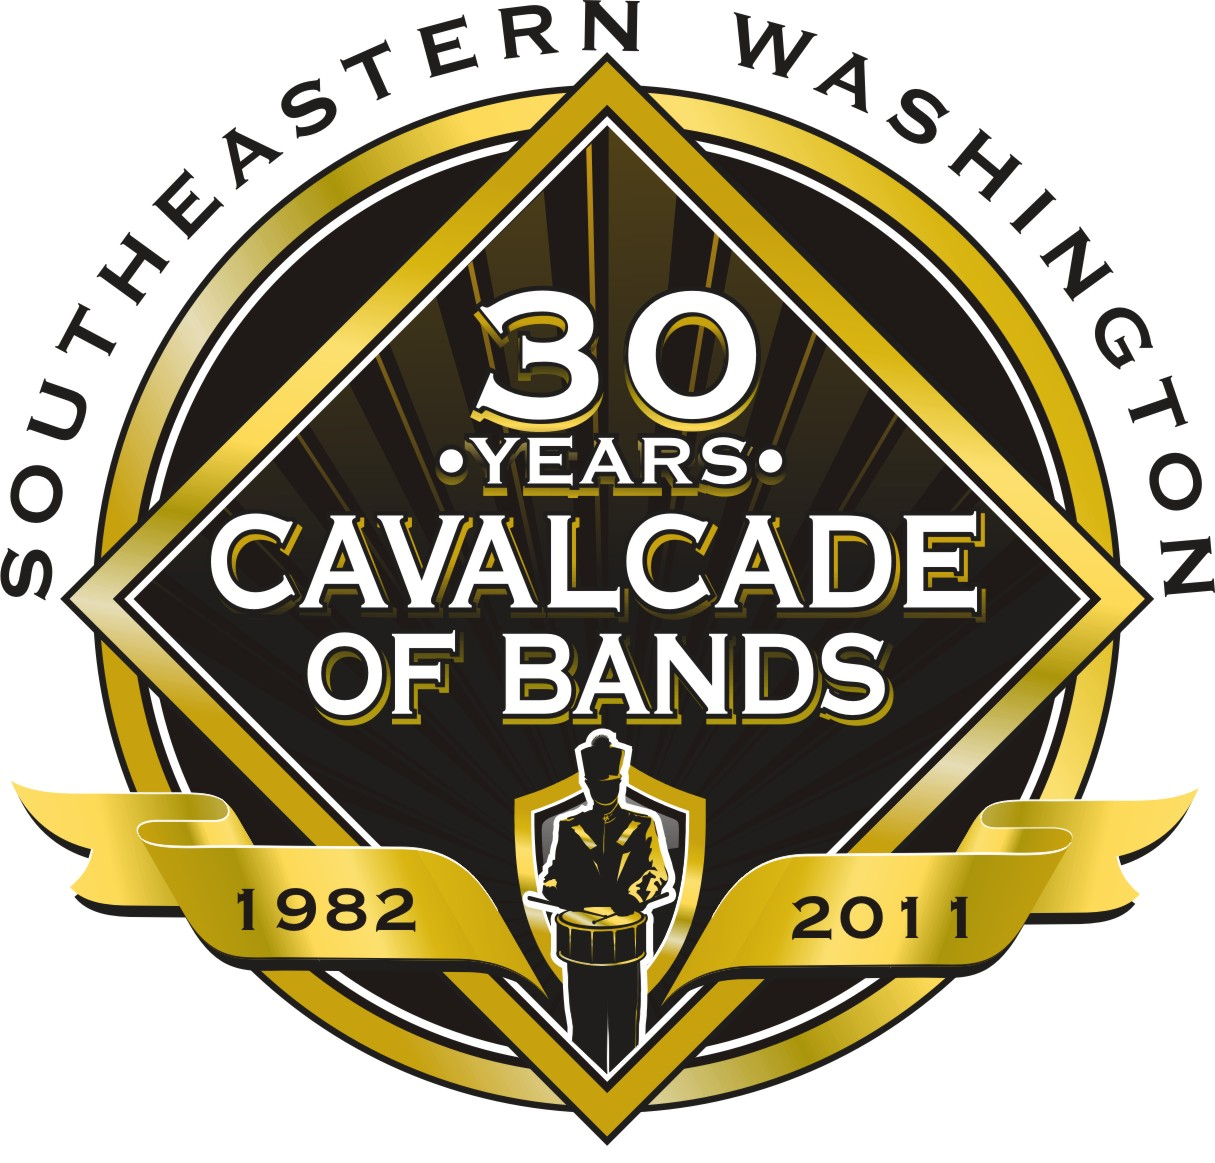 Southeastern Washington Cavalcade of Bands